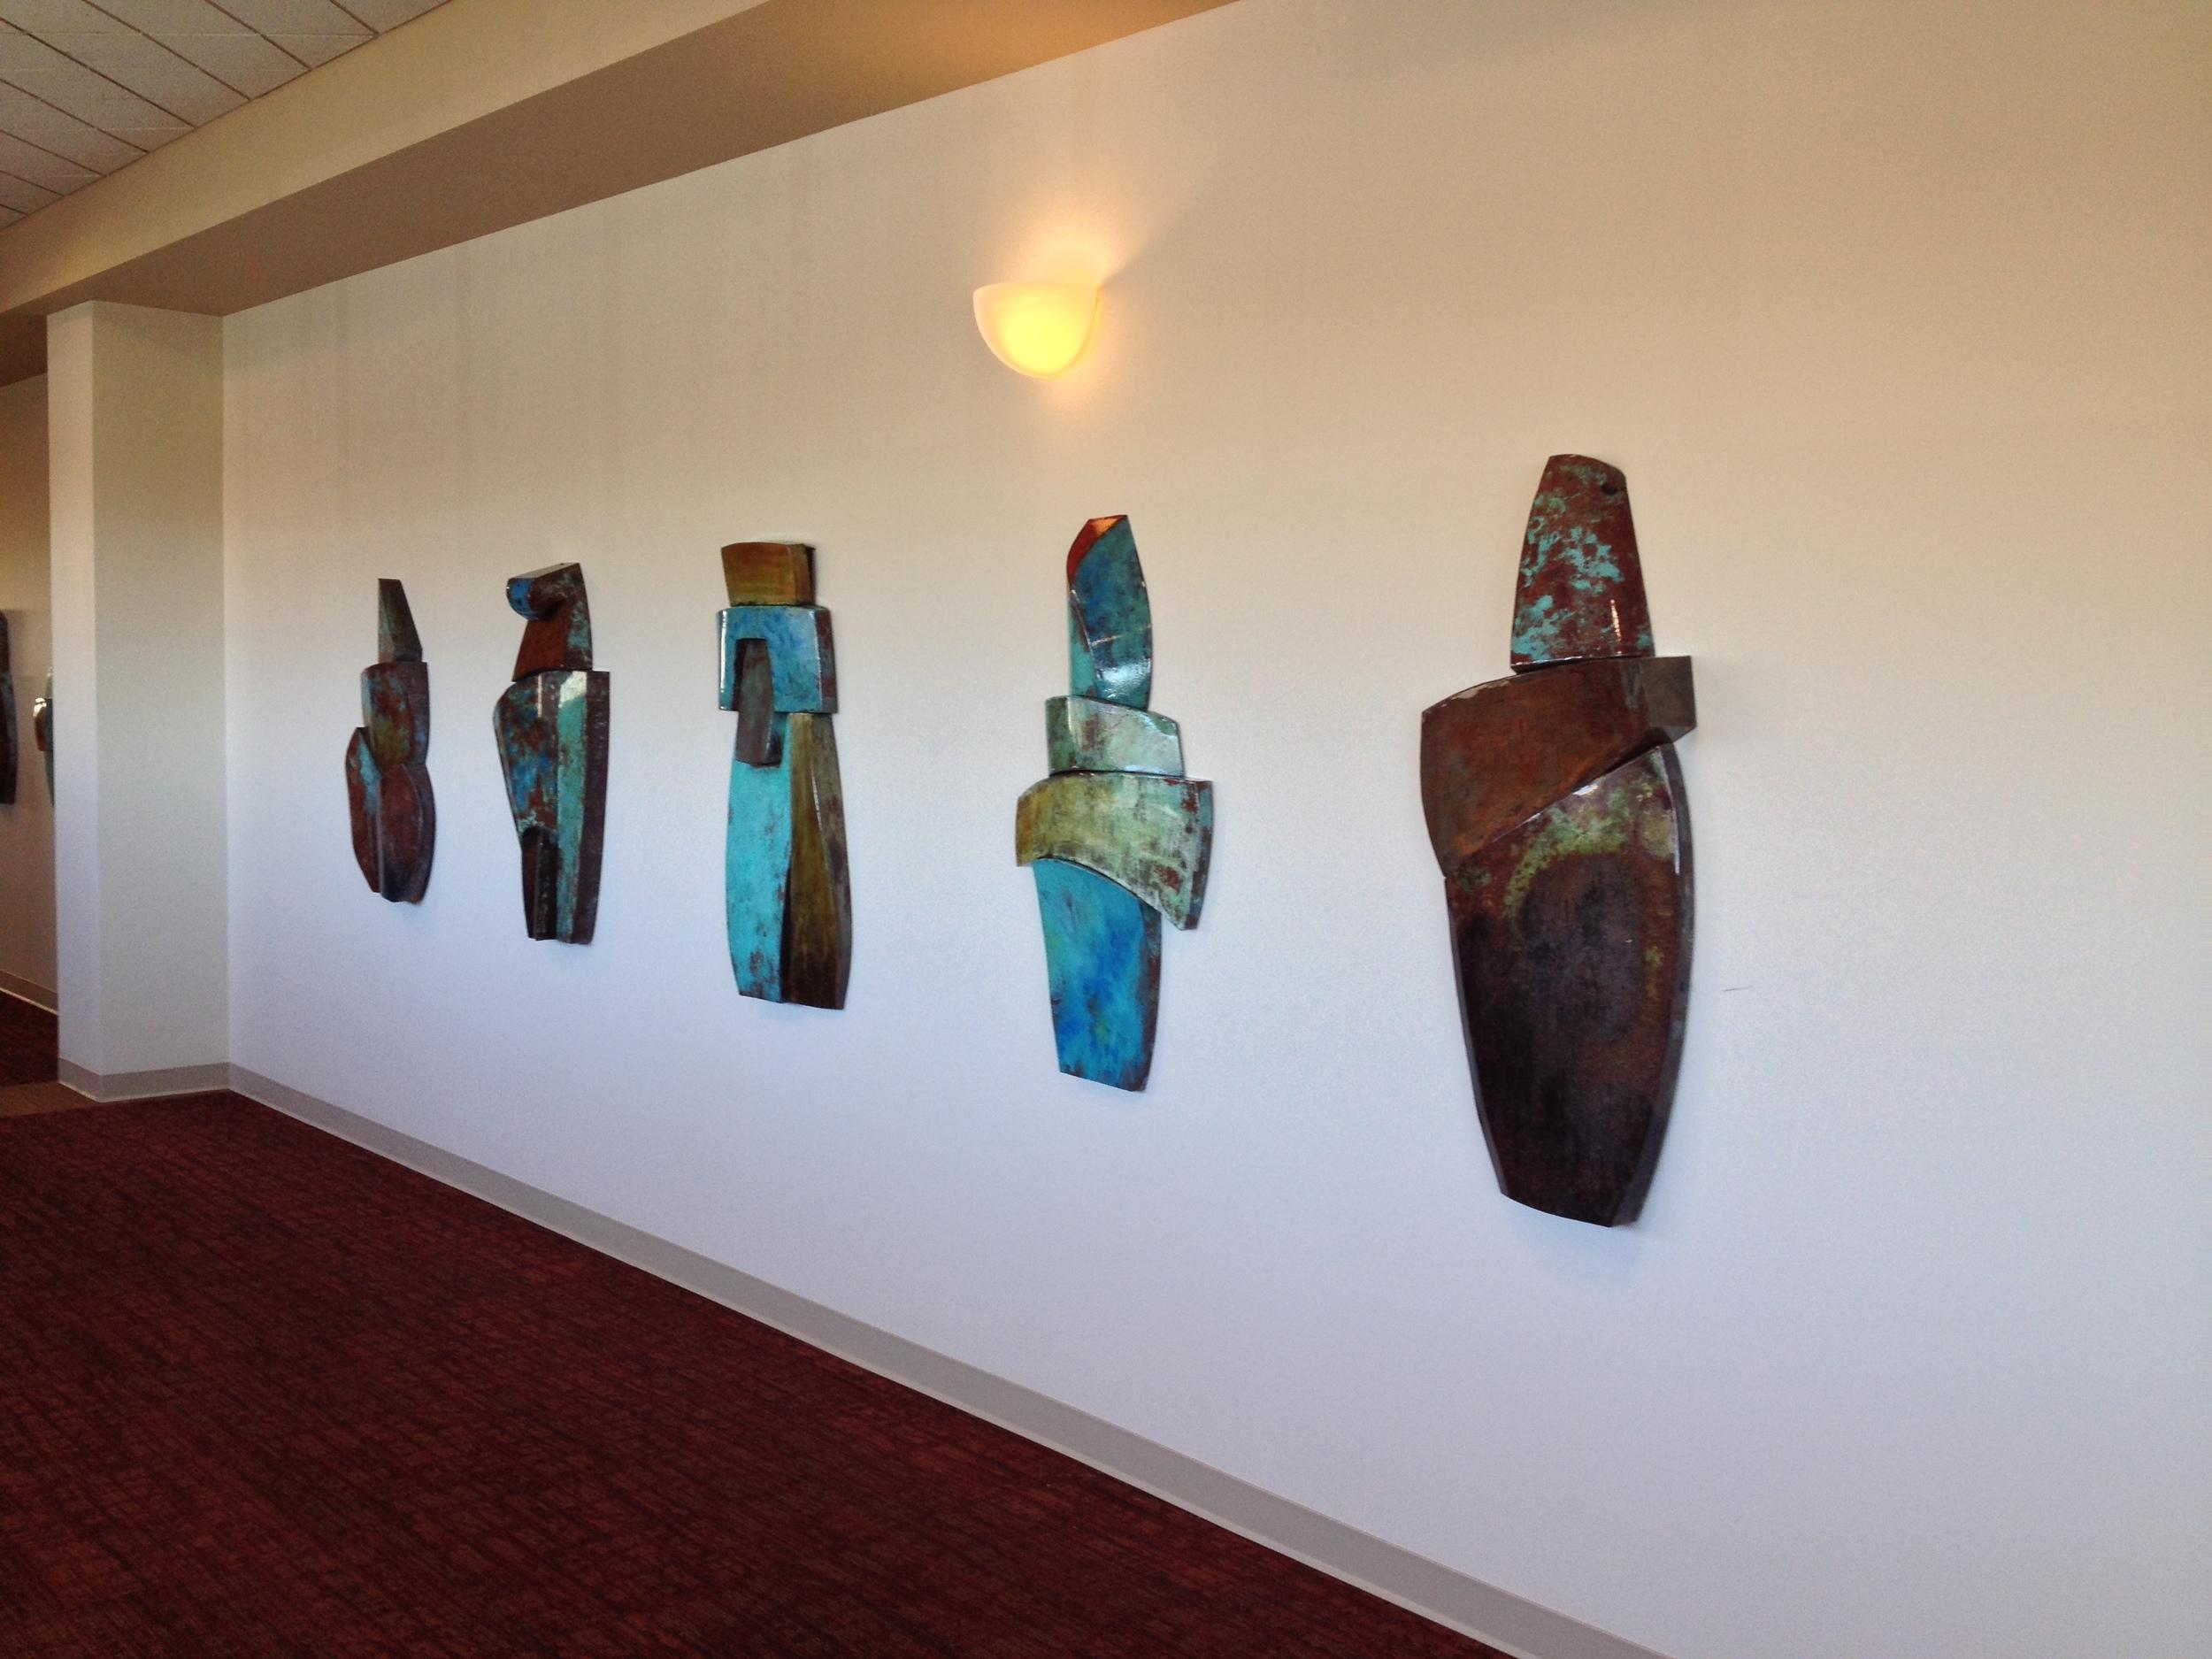 Installations for City of Albuquerque Public Art, Convention Center, 2015